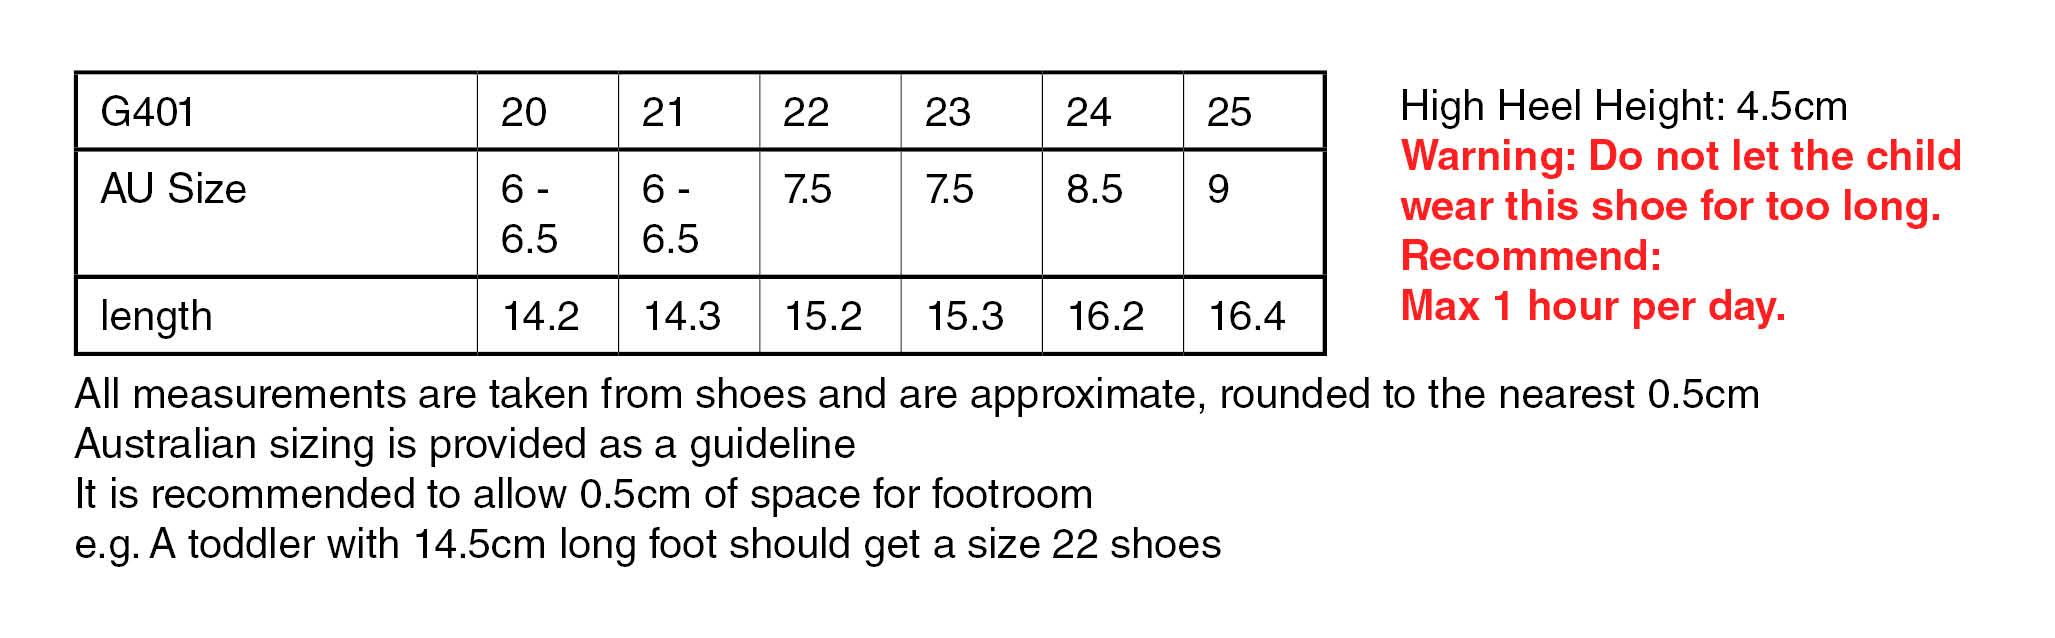 G401 Measurement